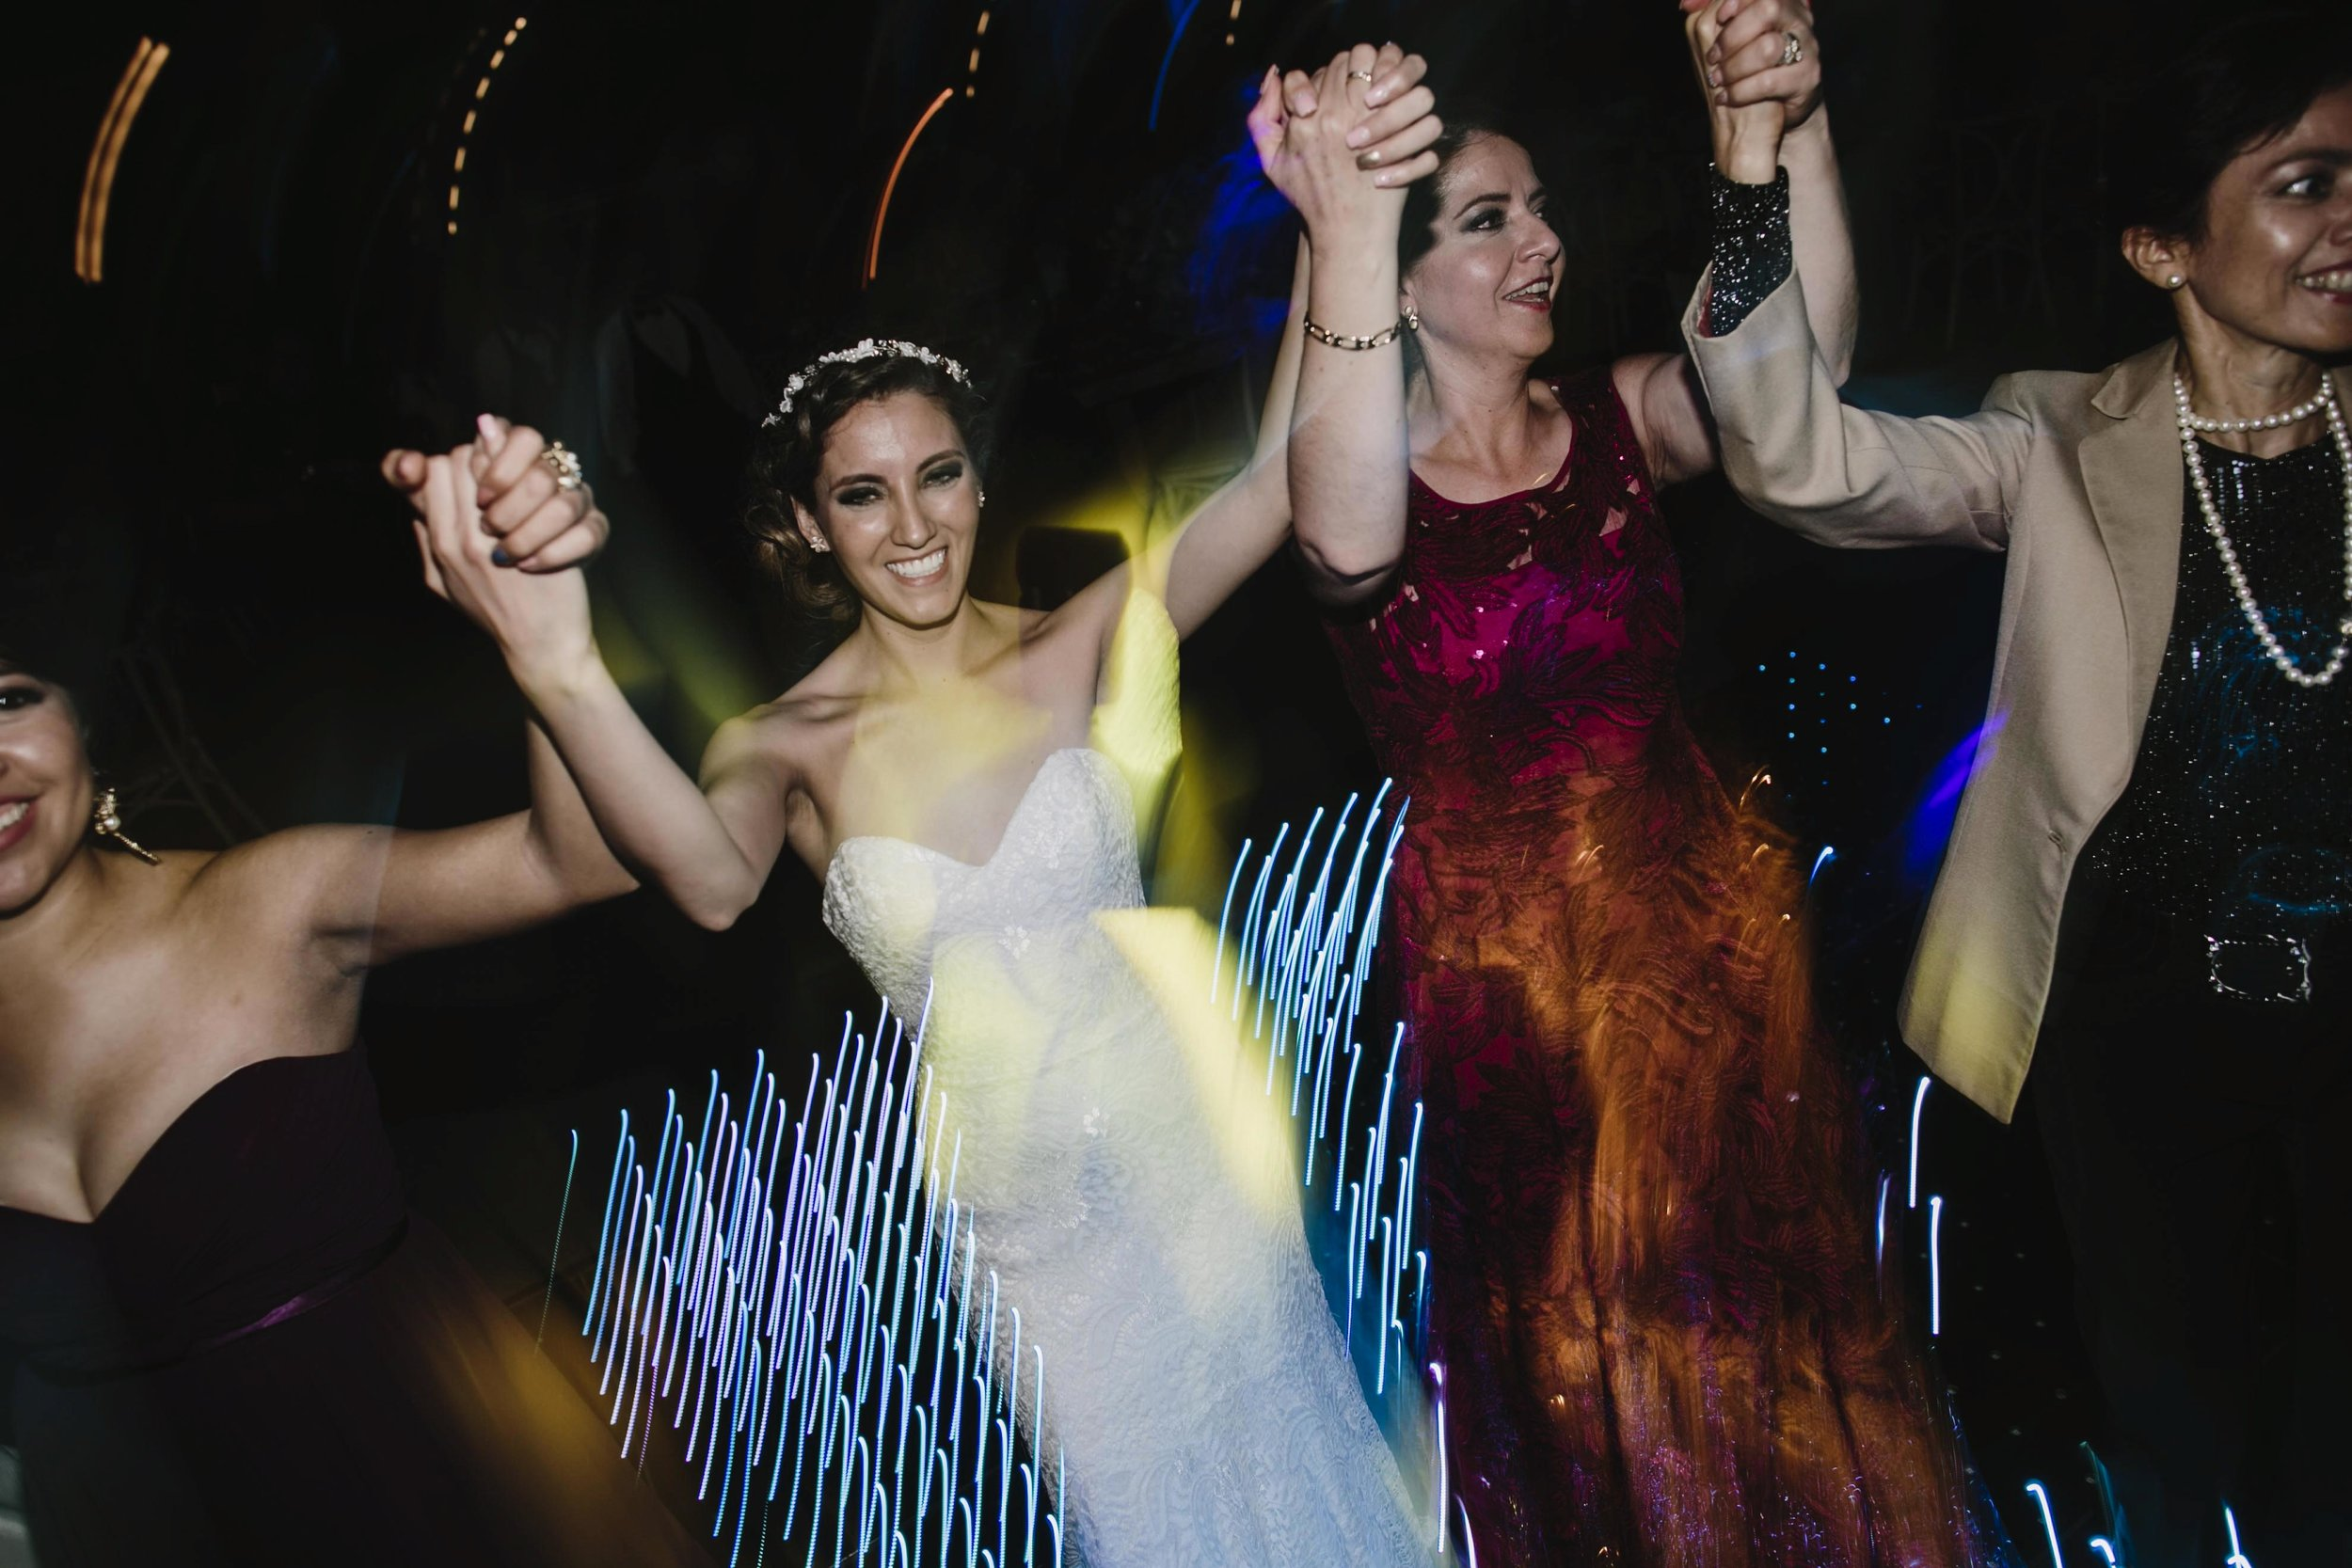 alfonso_flores_destination_wedding_photography_jardin_amarello_cuernavaca8.jpg